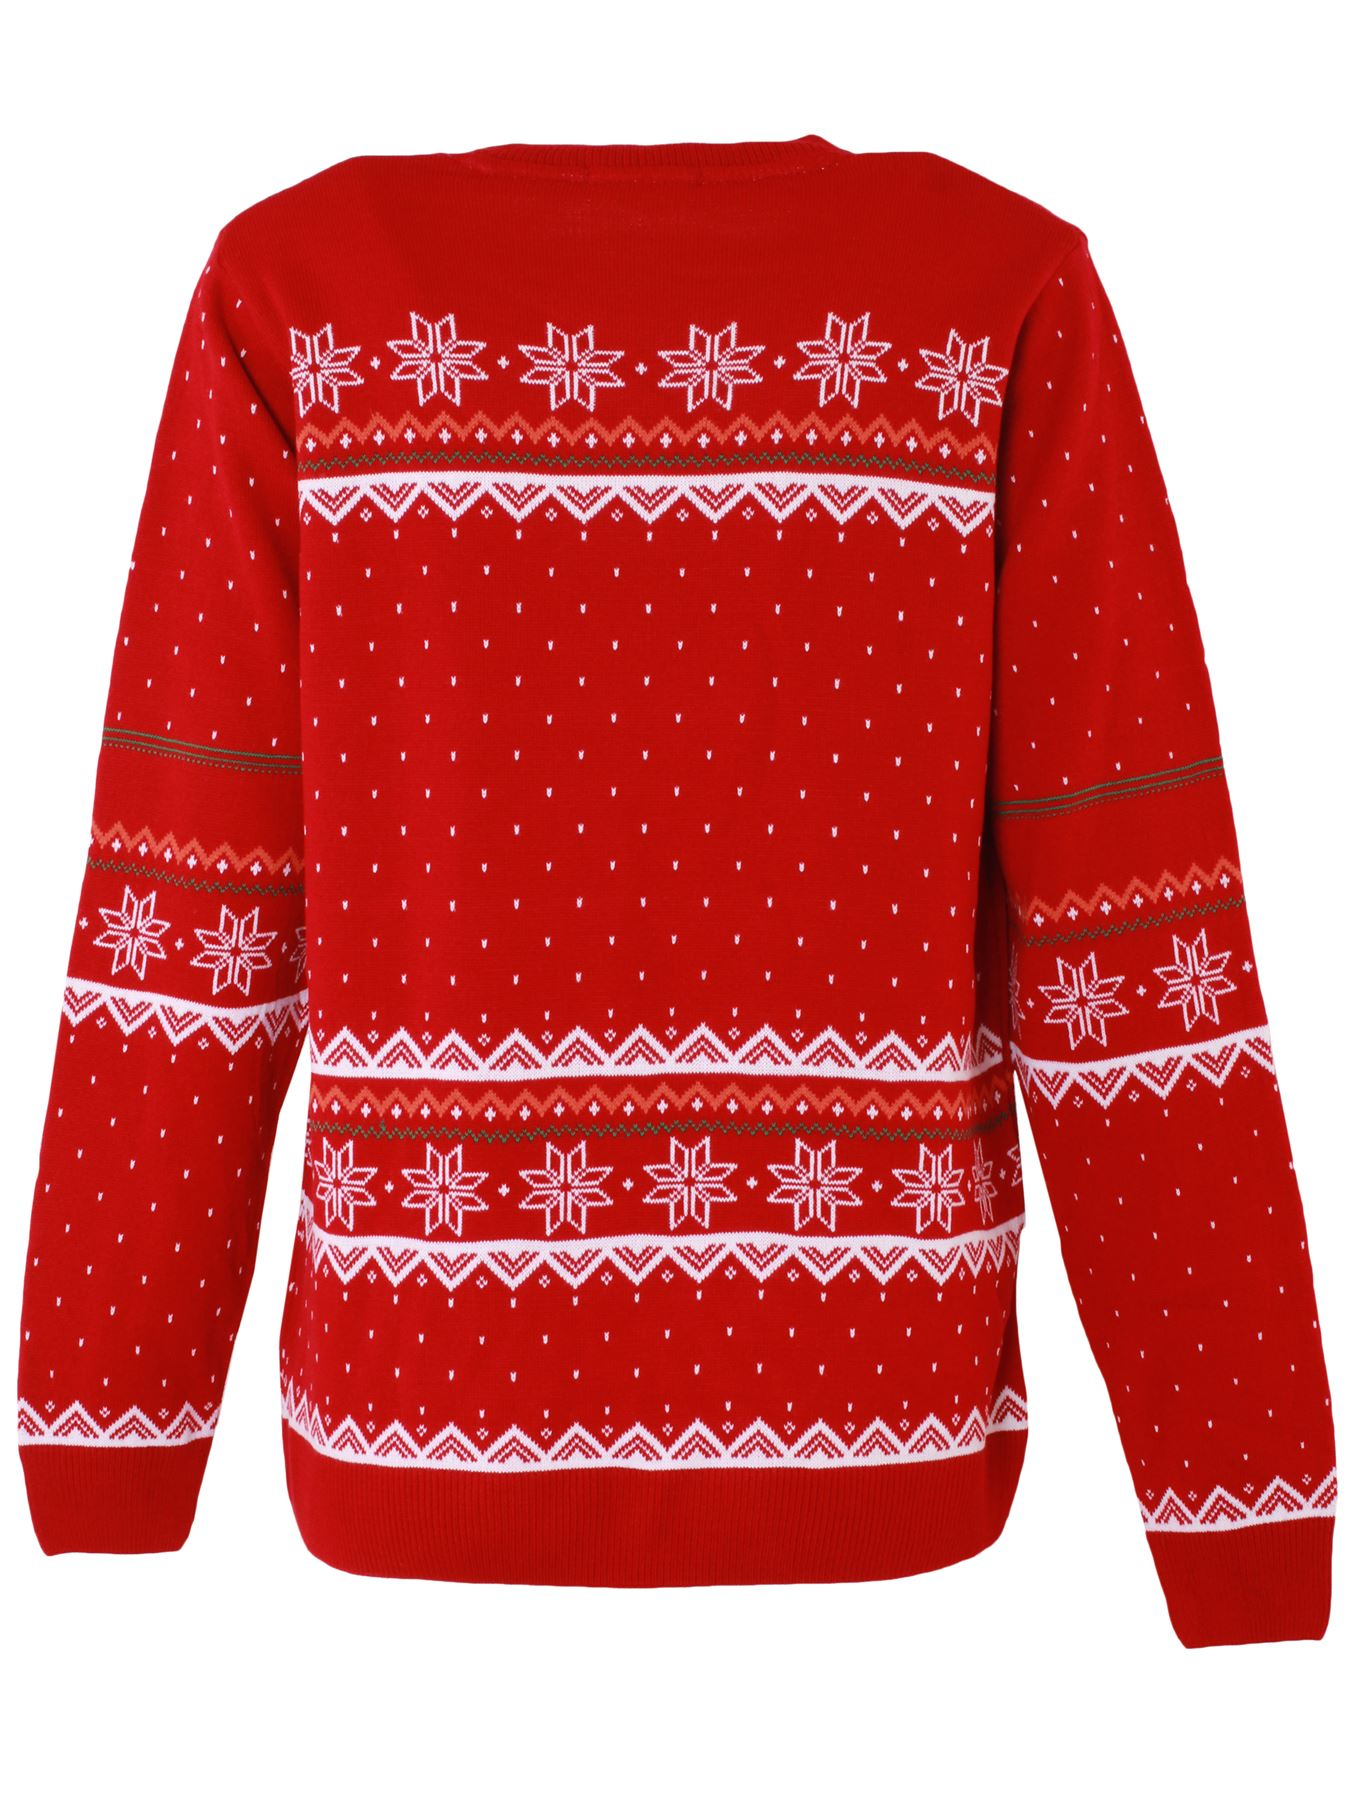 Unisex-Christmas-Jumper-Girls-Boys-Reindeer-Snow-Flake-Knitted-Pullover-Sweater thumbnail 7